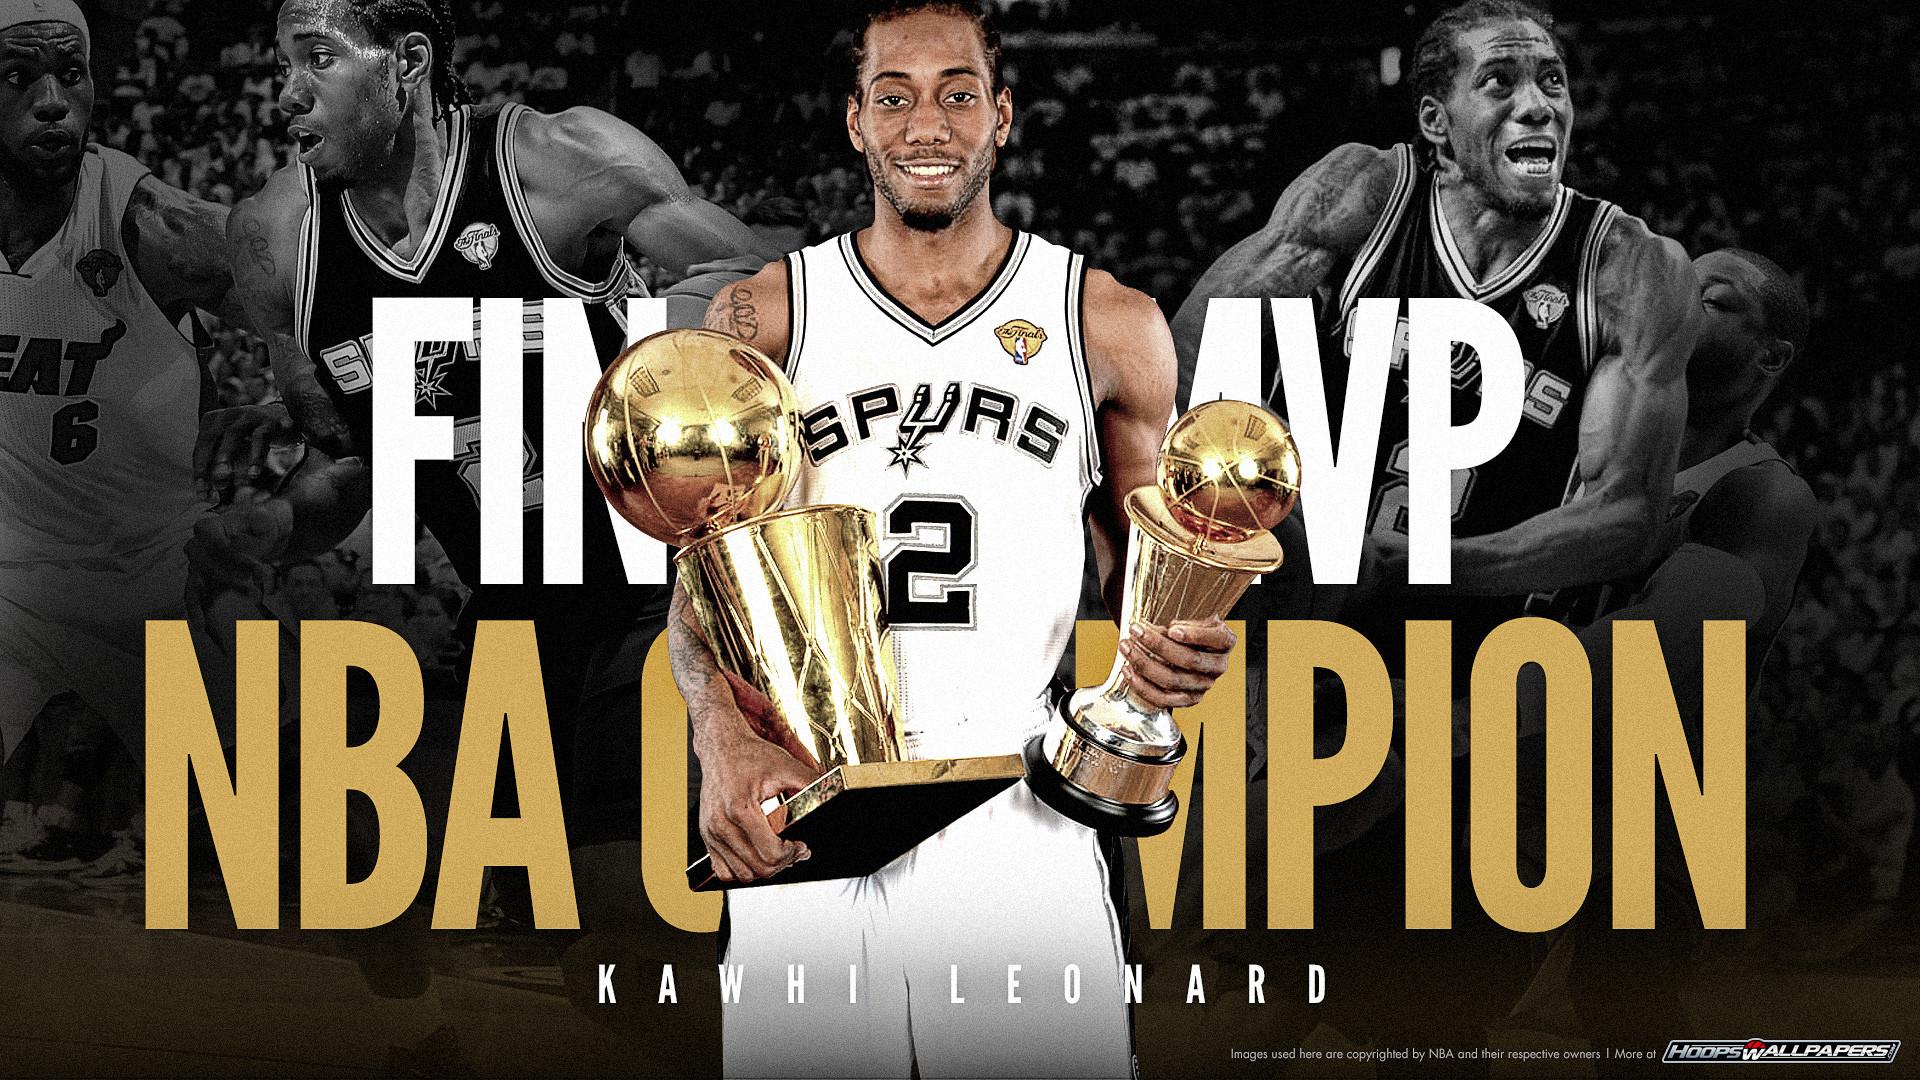 NBA Champion & Finals MVP Kawhi Leonard wallpaper (Click on the image for  the full HD resolution wallpaper)